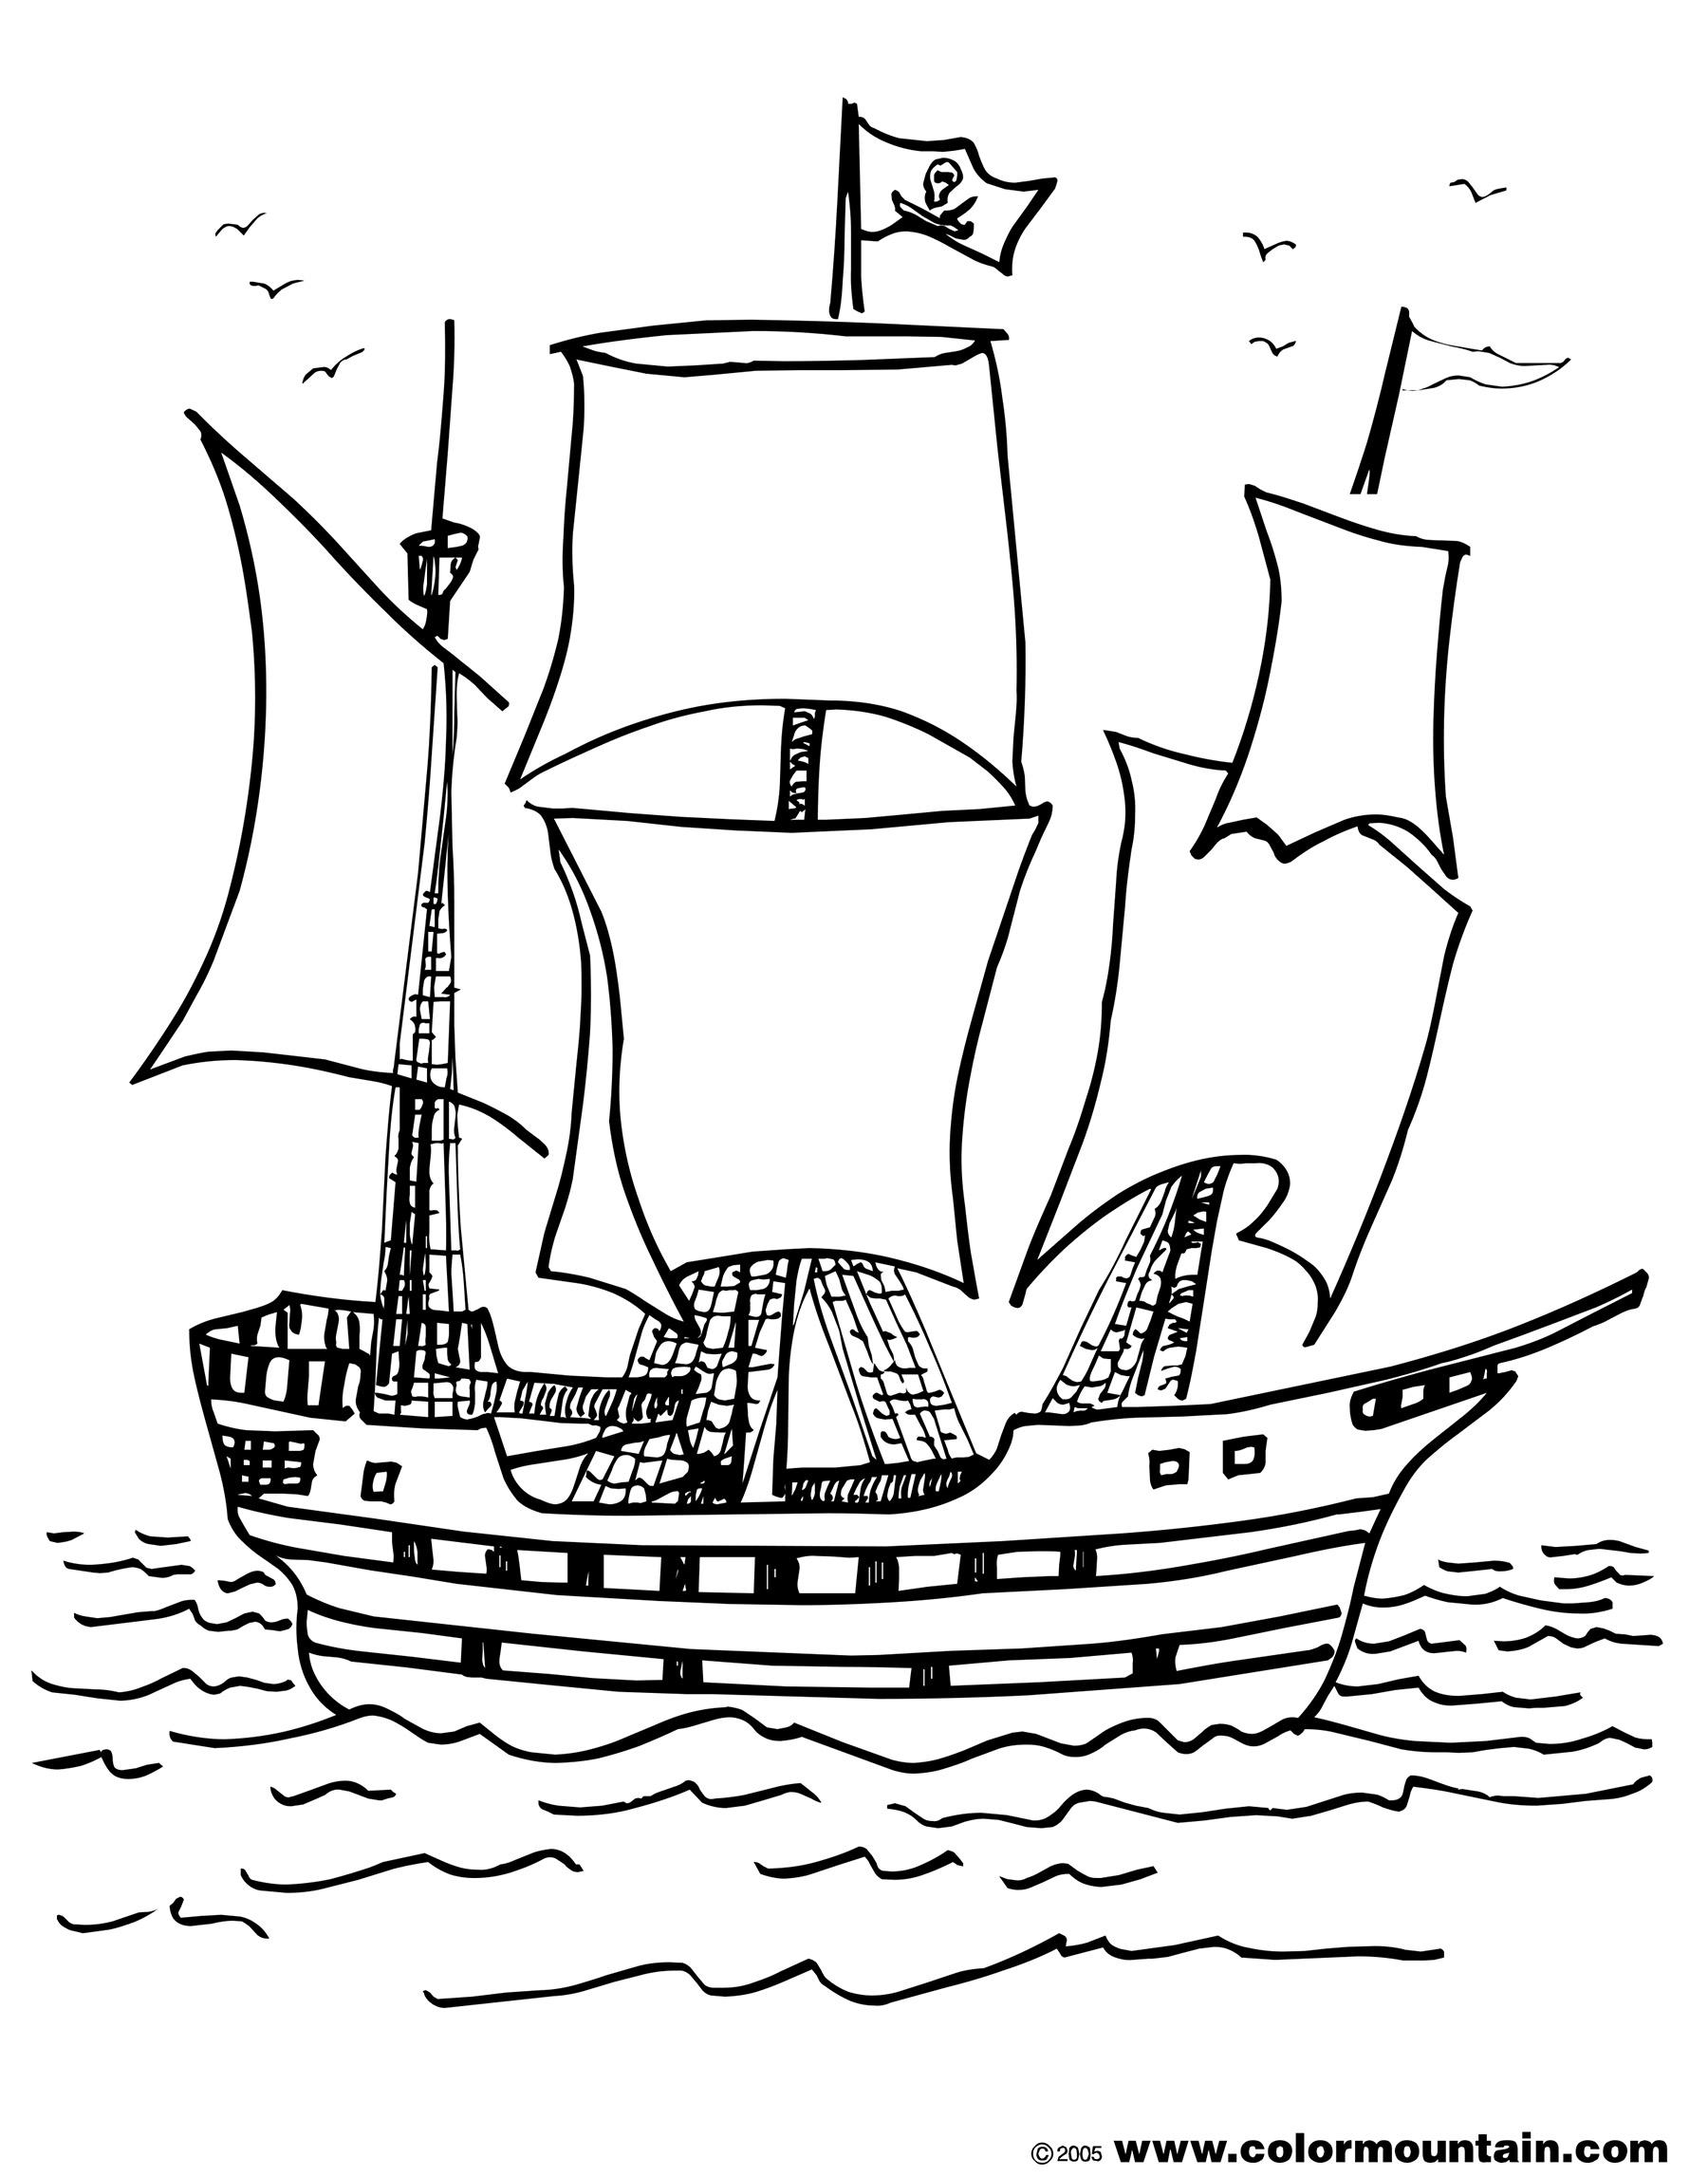 17 Dessins De Coloriage Bateau Pirate à Imprimer